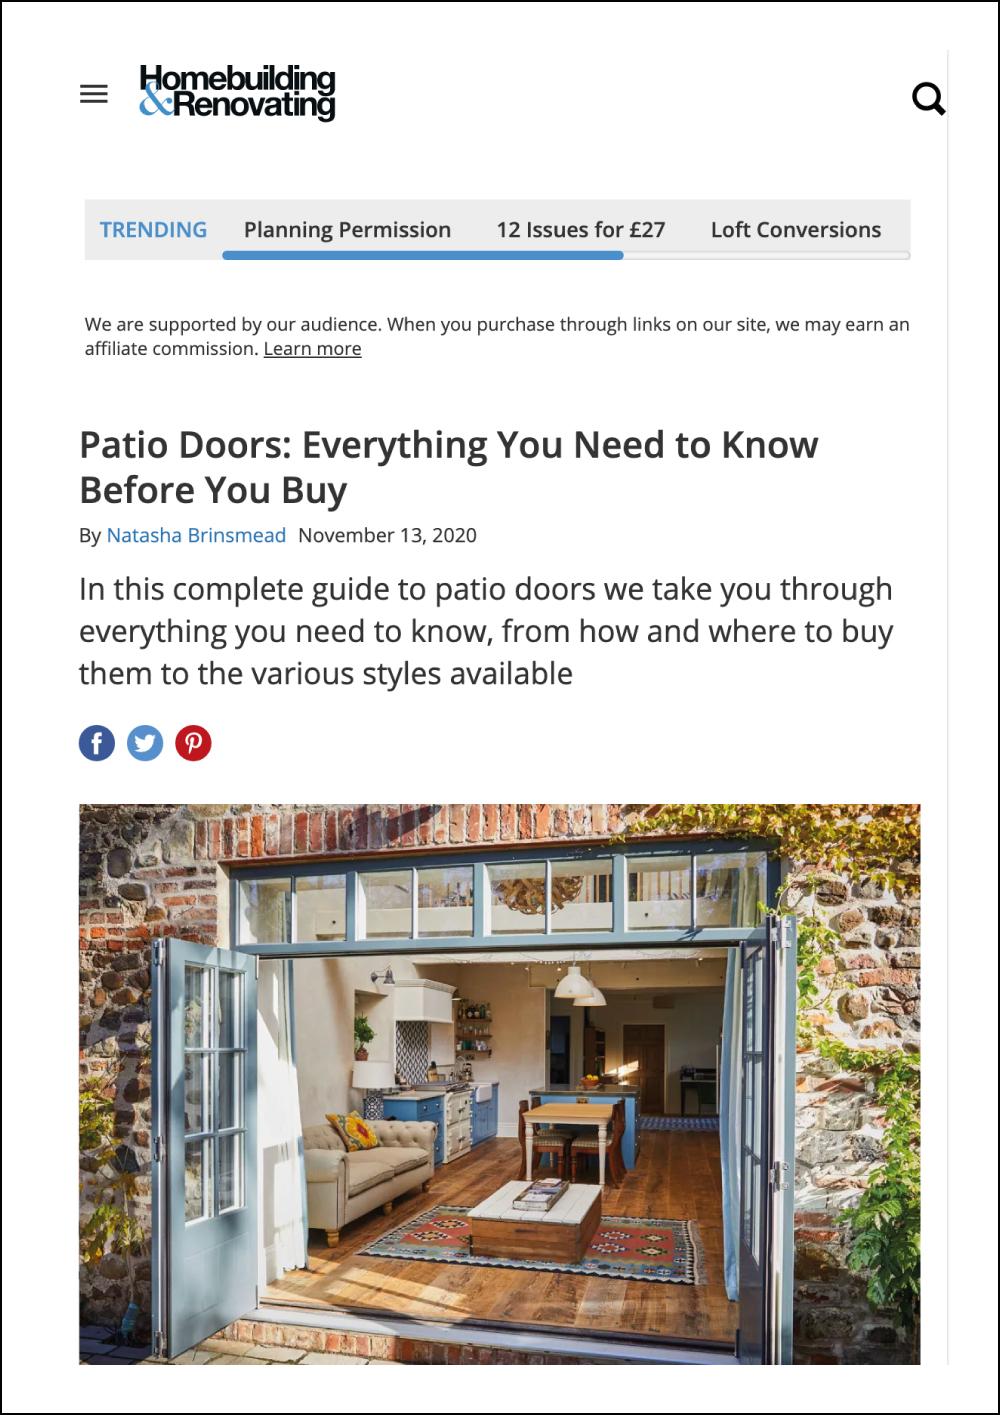 Homebuilding & Renovating Online Magazine